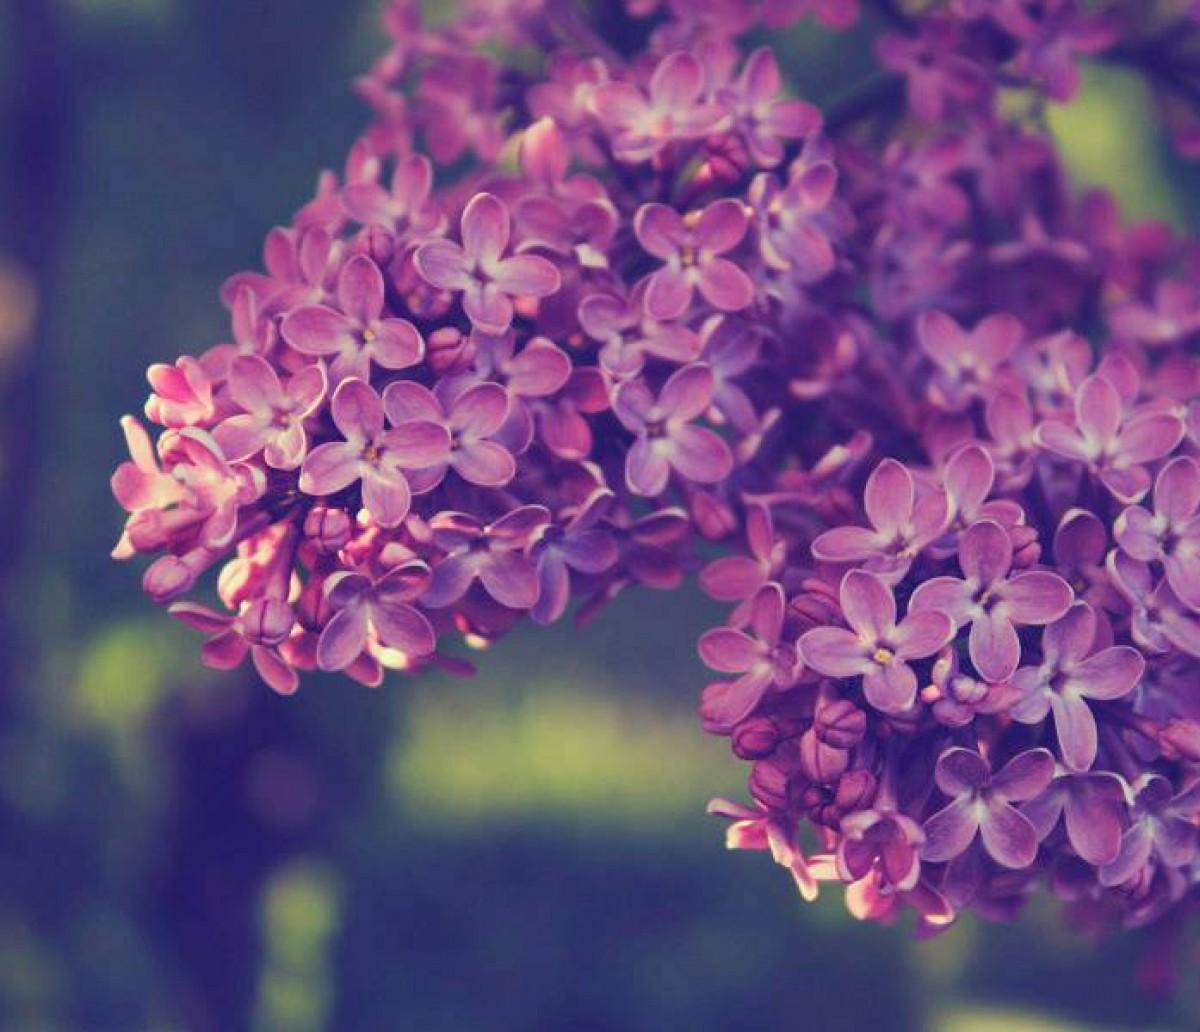 Tán hoa tử đinh hương cực đẹp